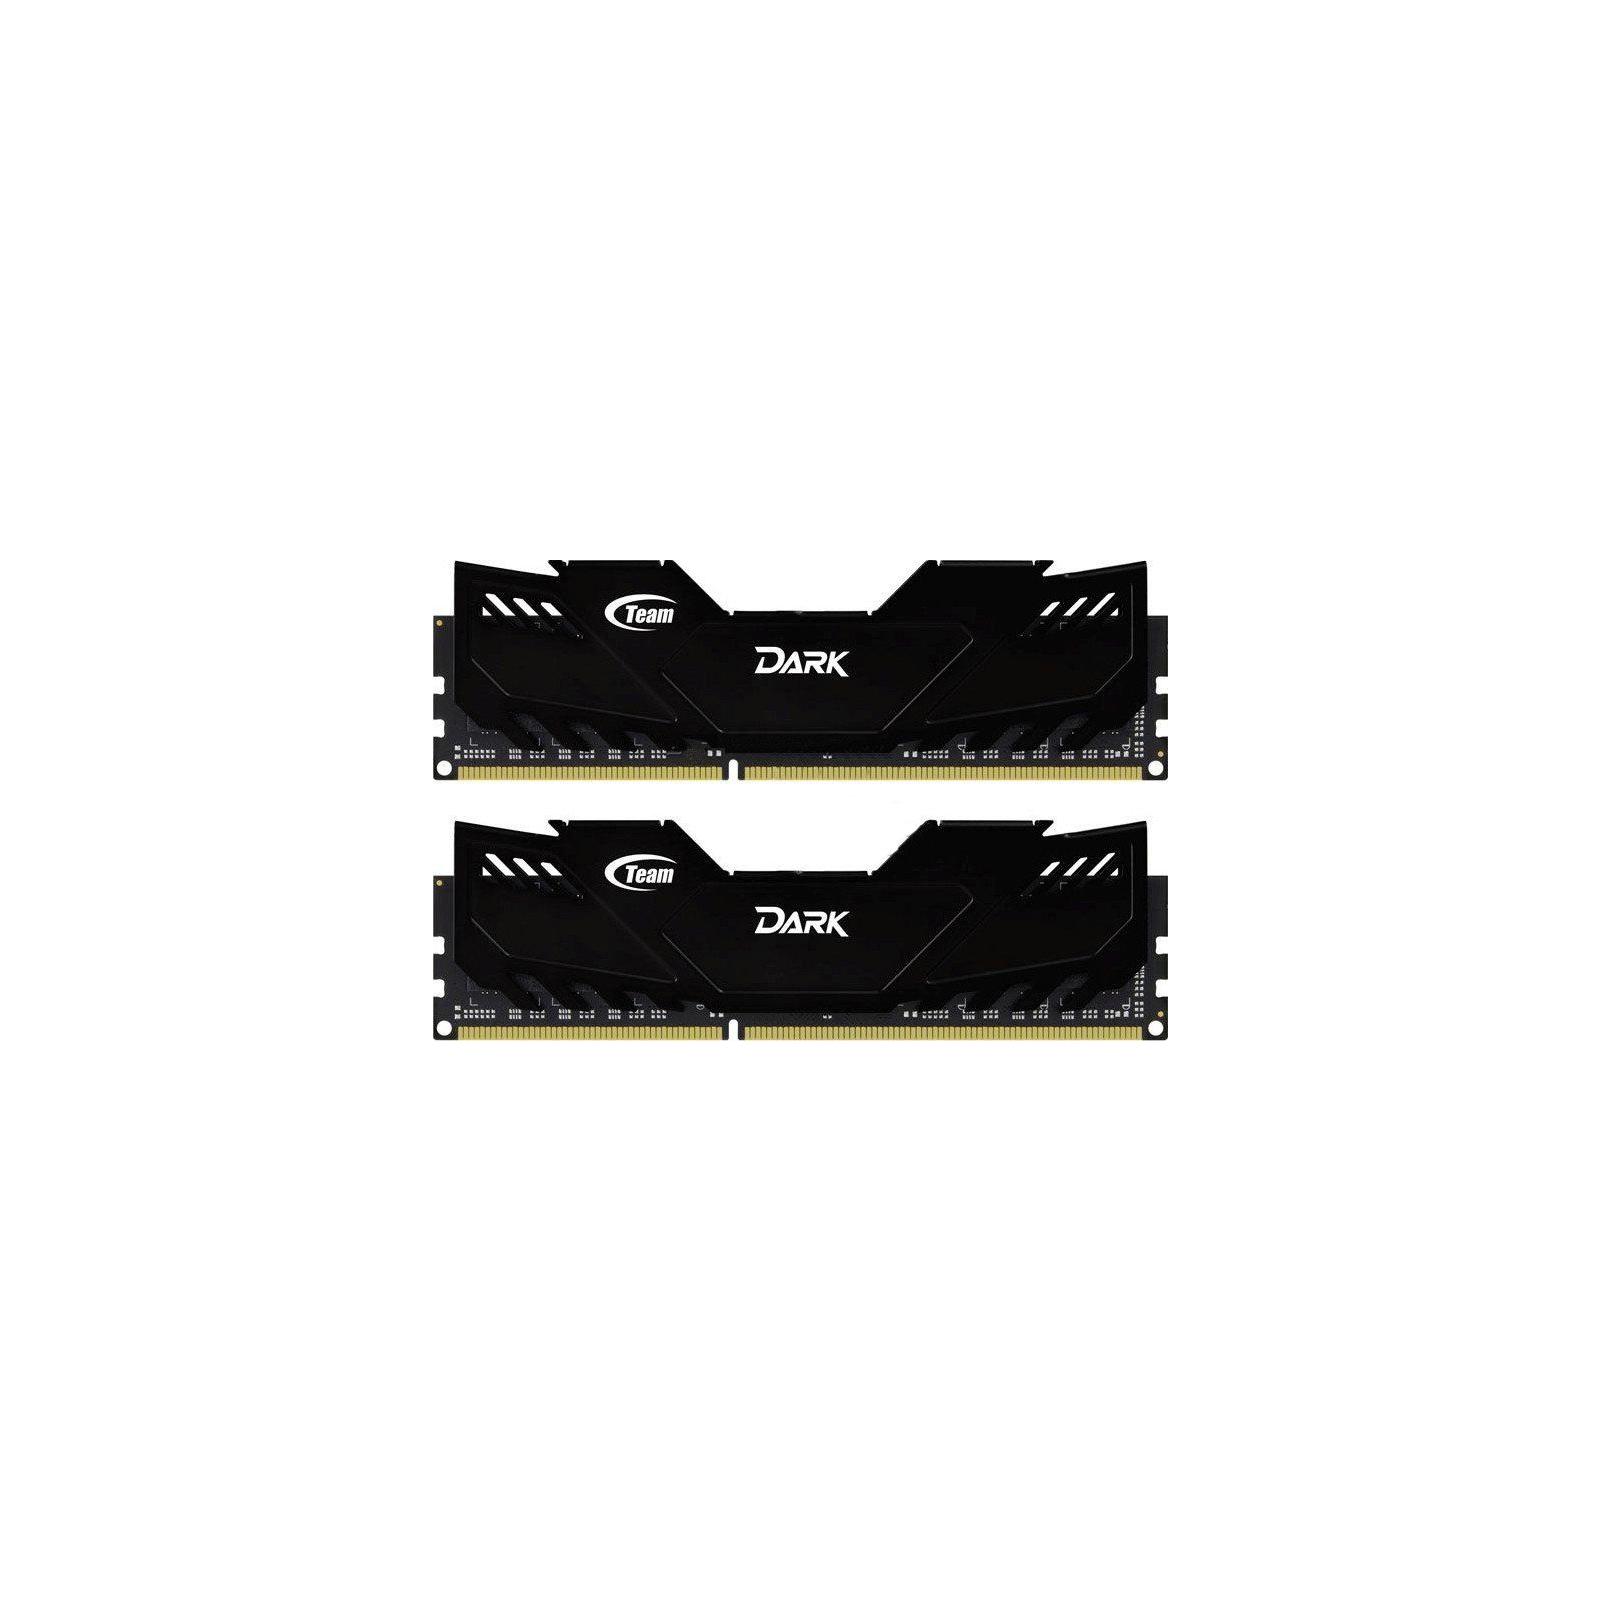 Модуль памяти для компьютера DDR4 8GB (2x4GB) 2800 MHz Dark Black Team (TDKED48G2800HC16ADC01)